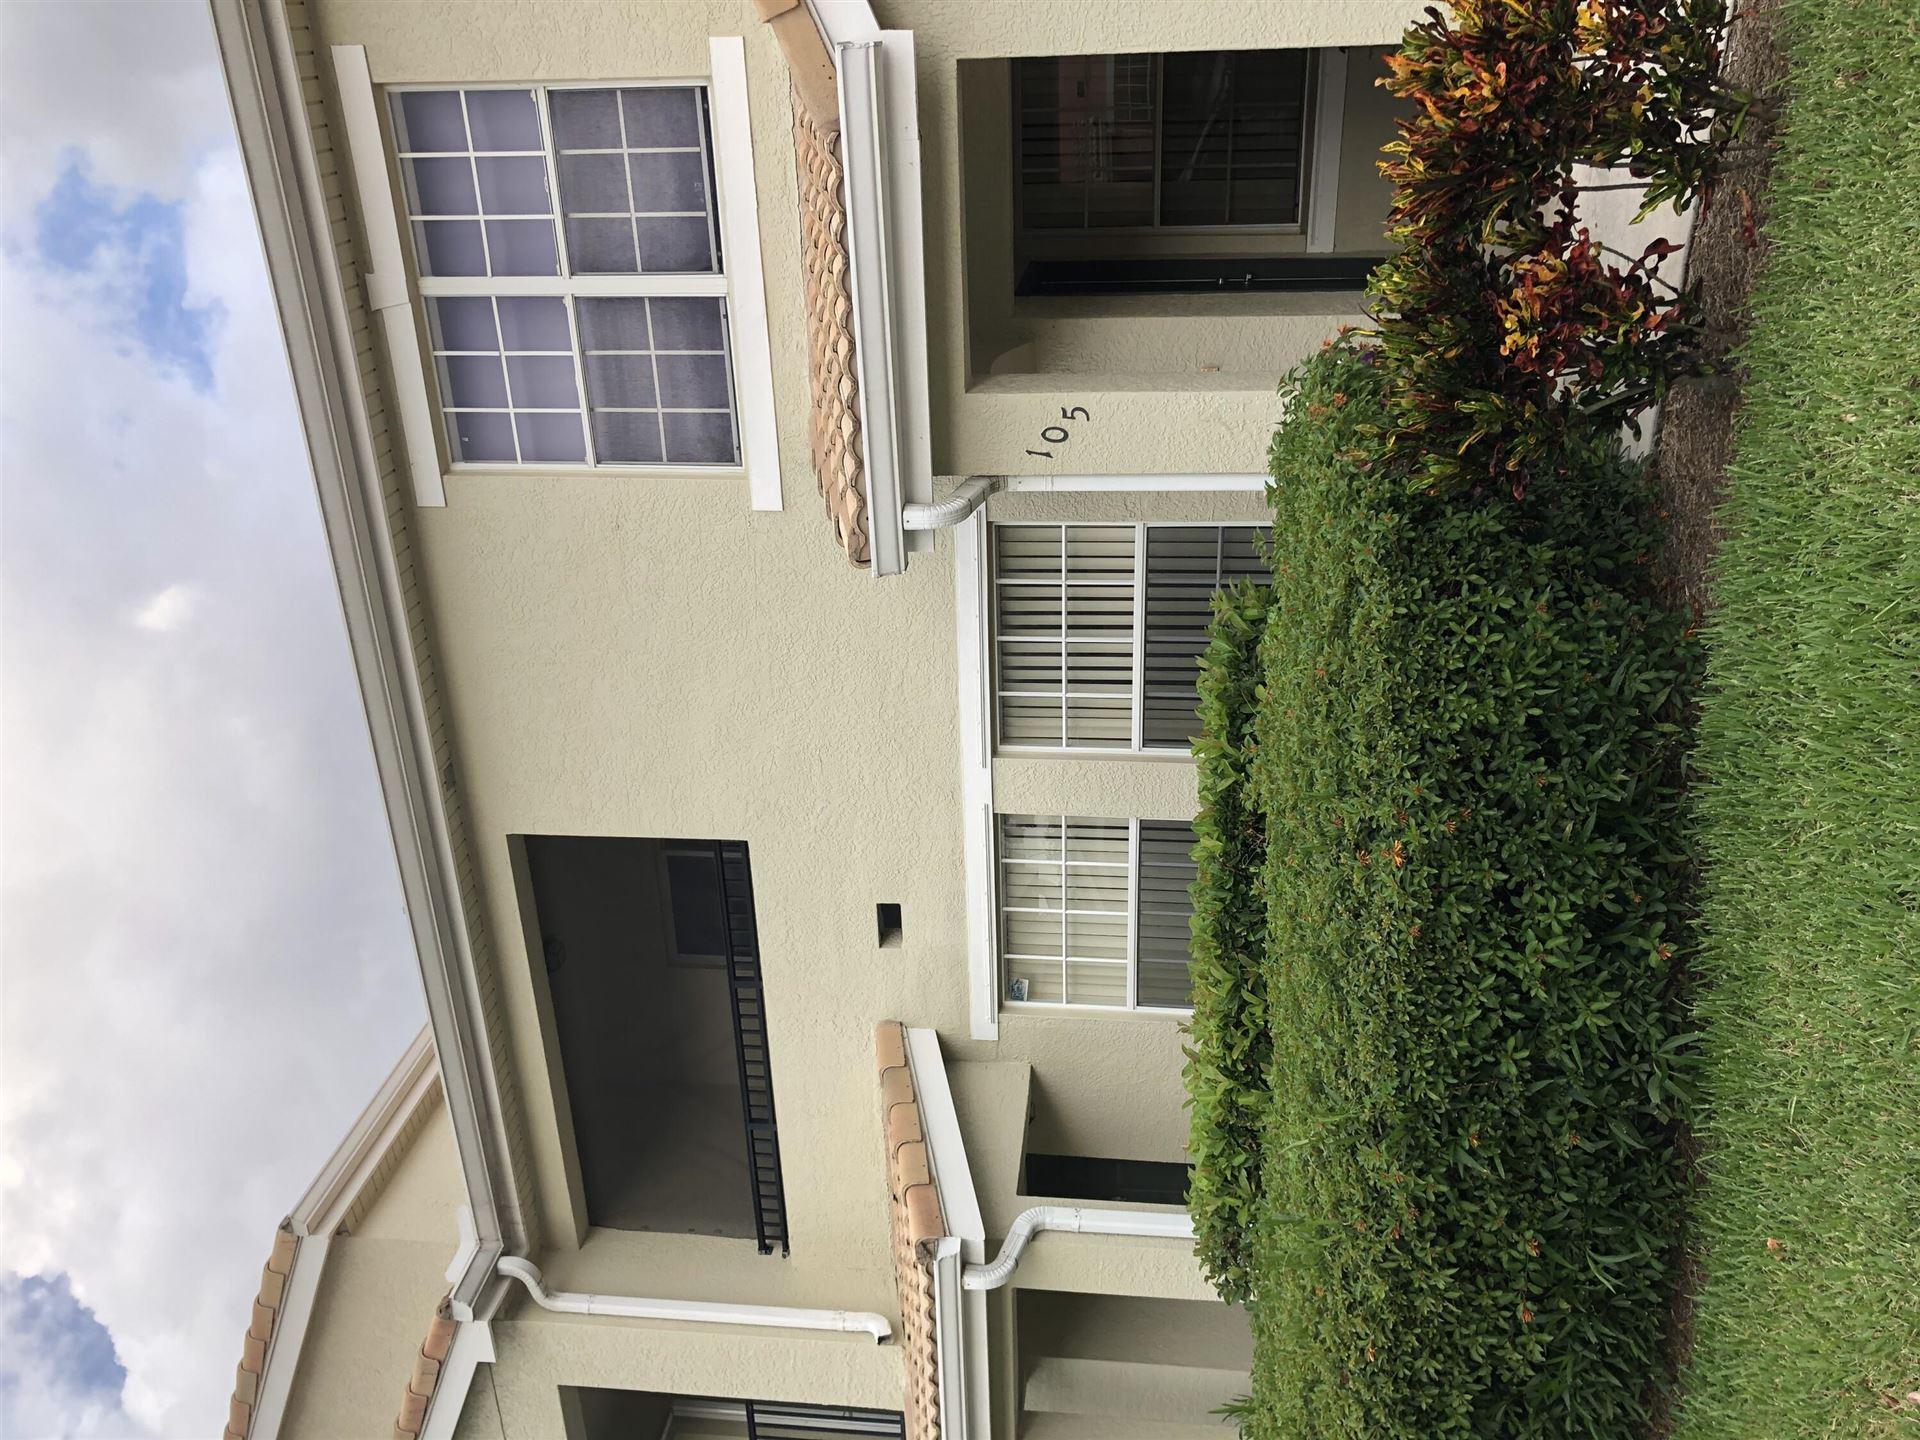 102 SW Peacock Boulevard SW #2105, Port Saint Lucie, FL 34986 - MLS#: RX-10720245